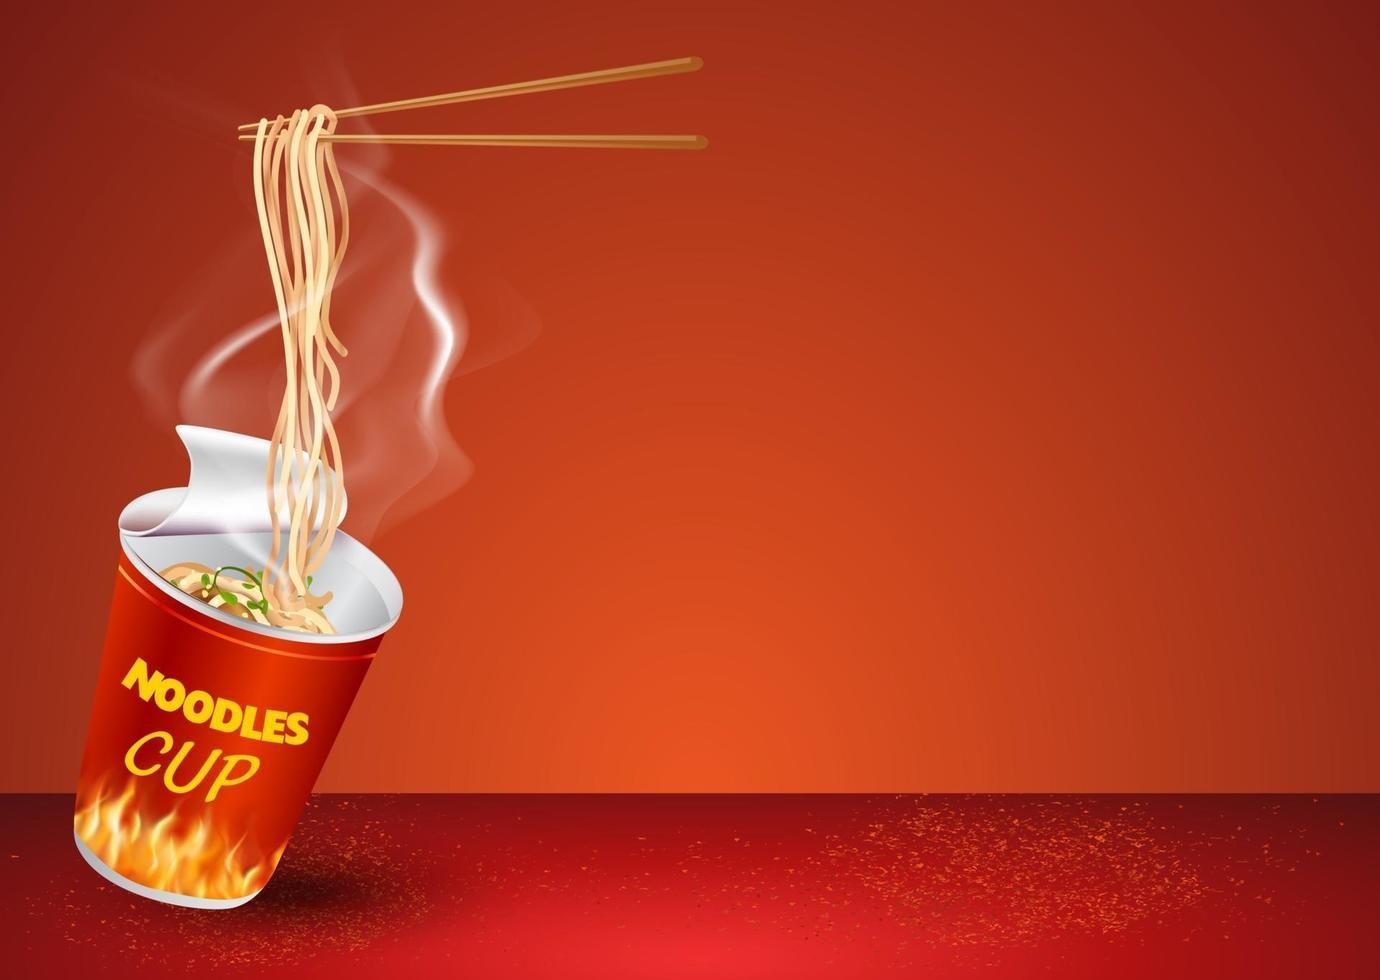 Instant cup noodles design template vector